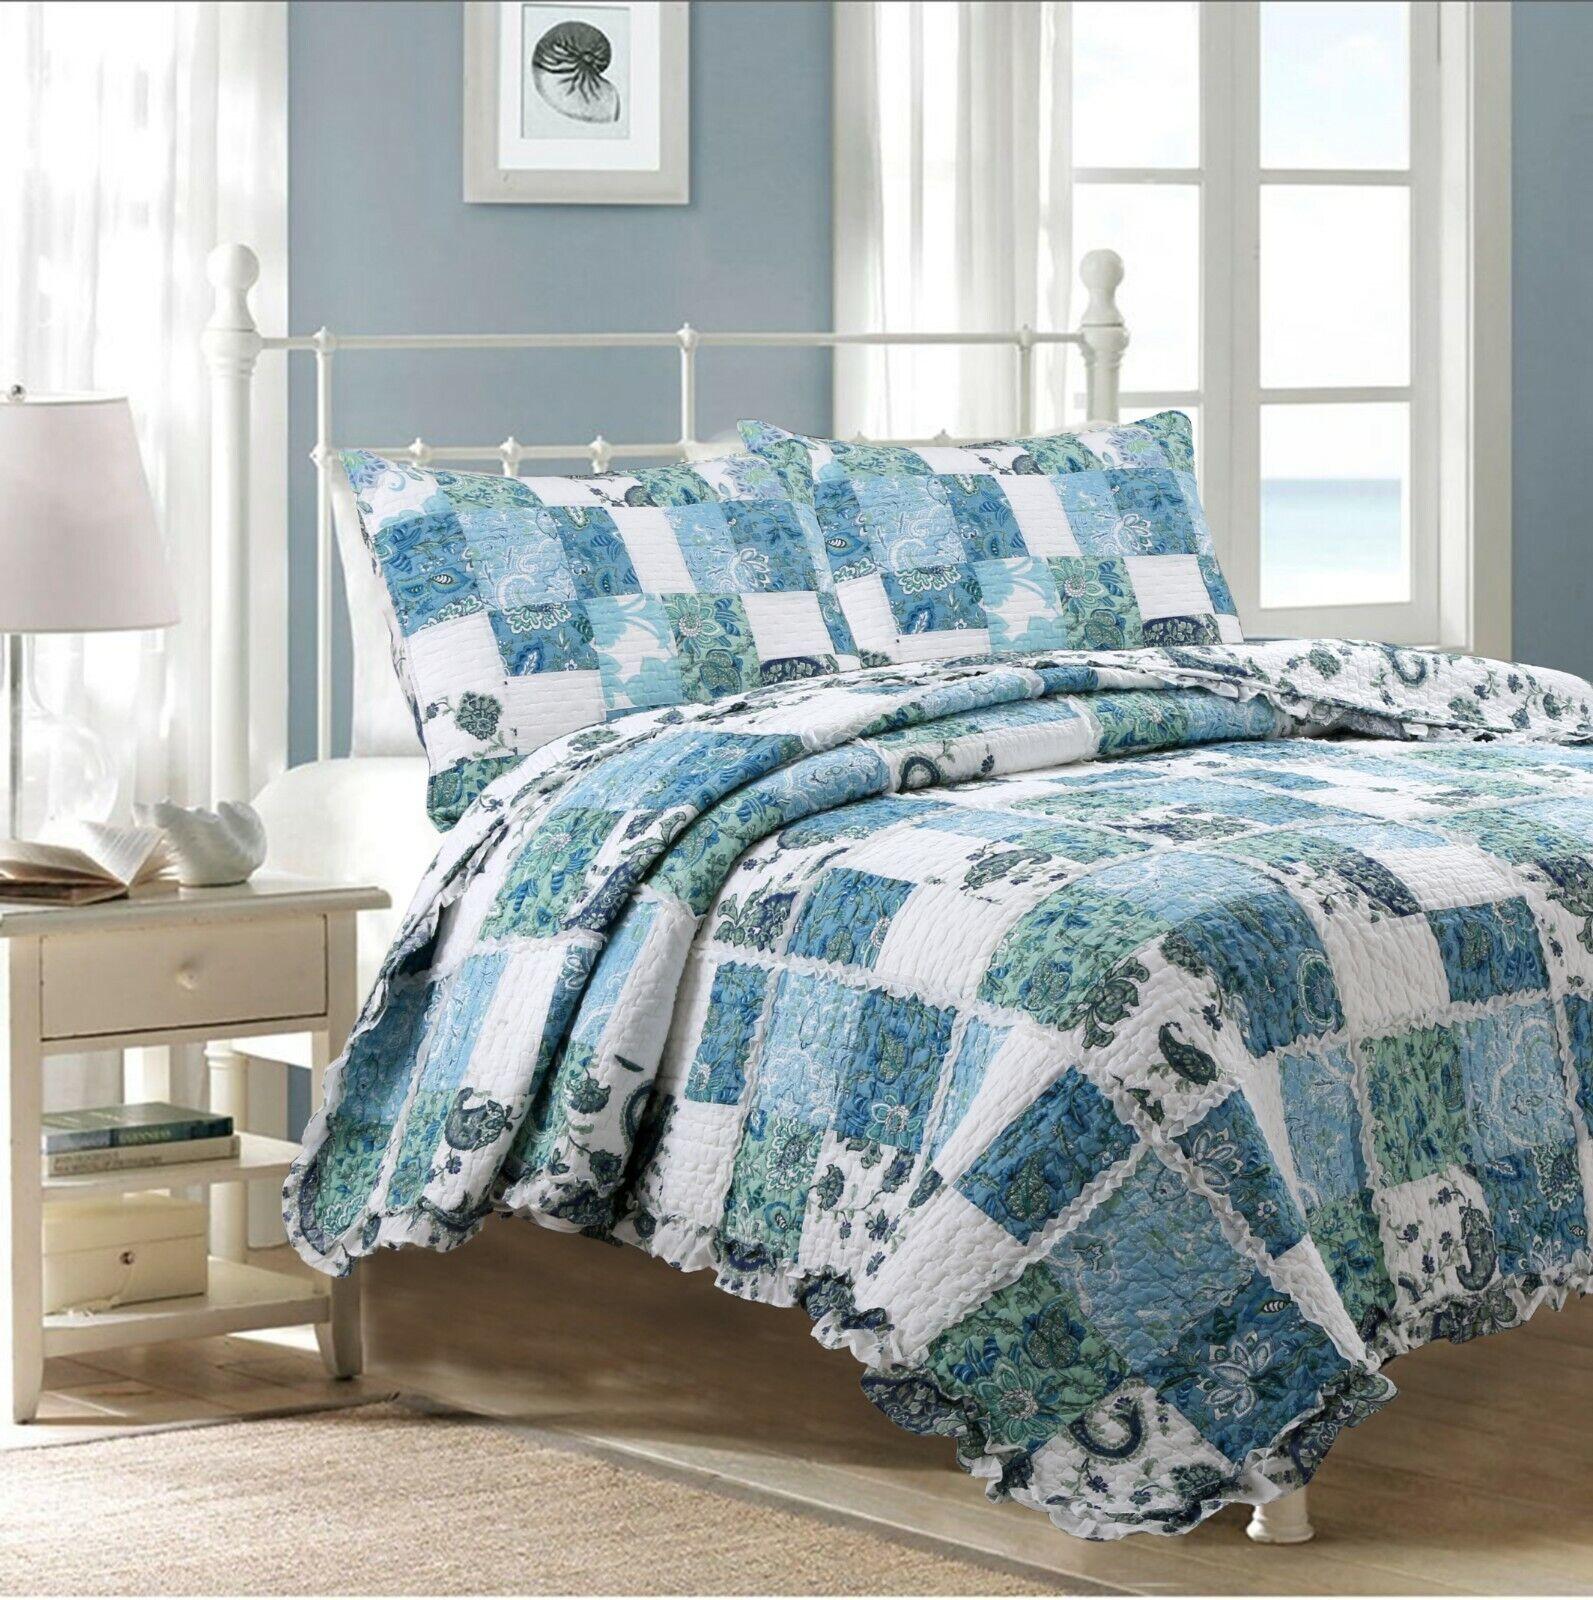 Calypso Real Patchwork 100%Cotton Quilt Set, Bedspread, Coverlet